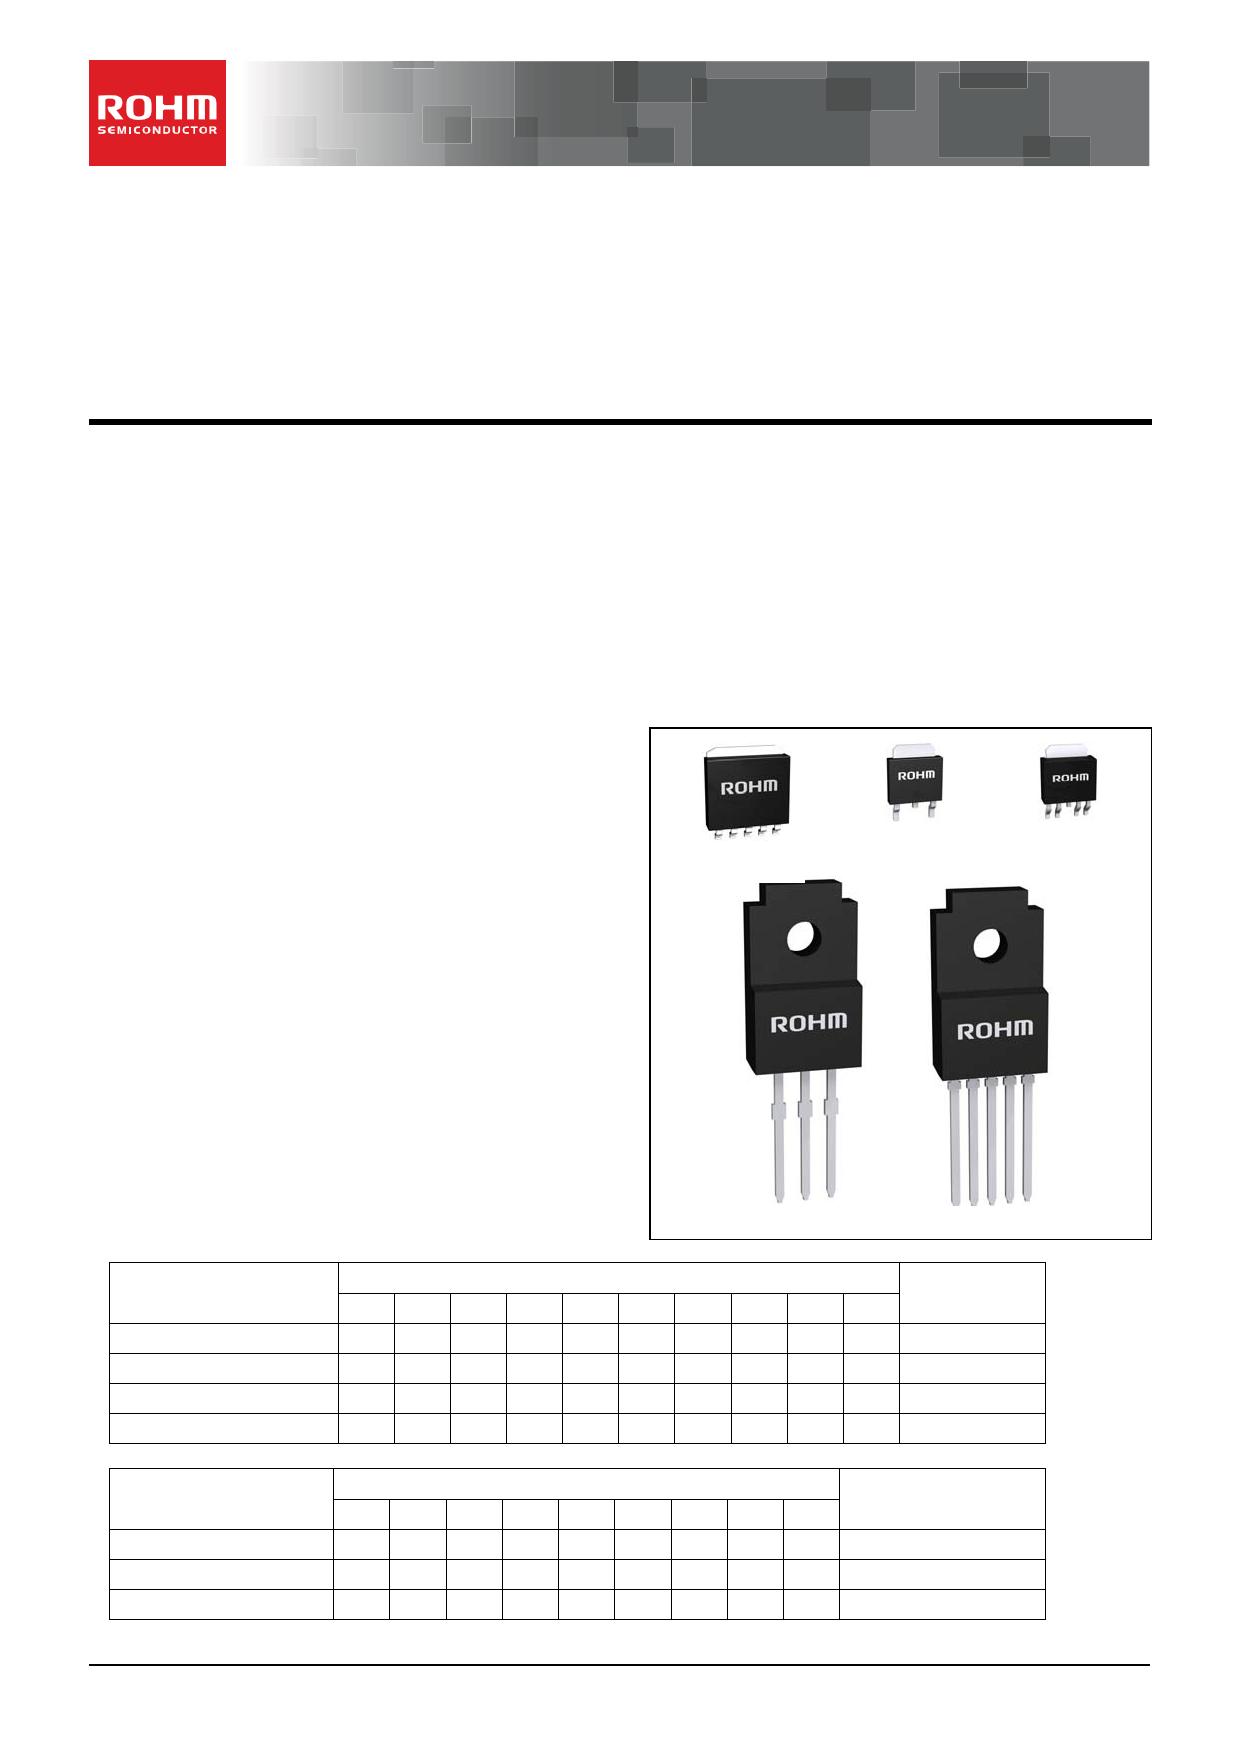 BA07CC0FP-E2 datasheet